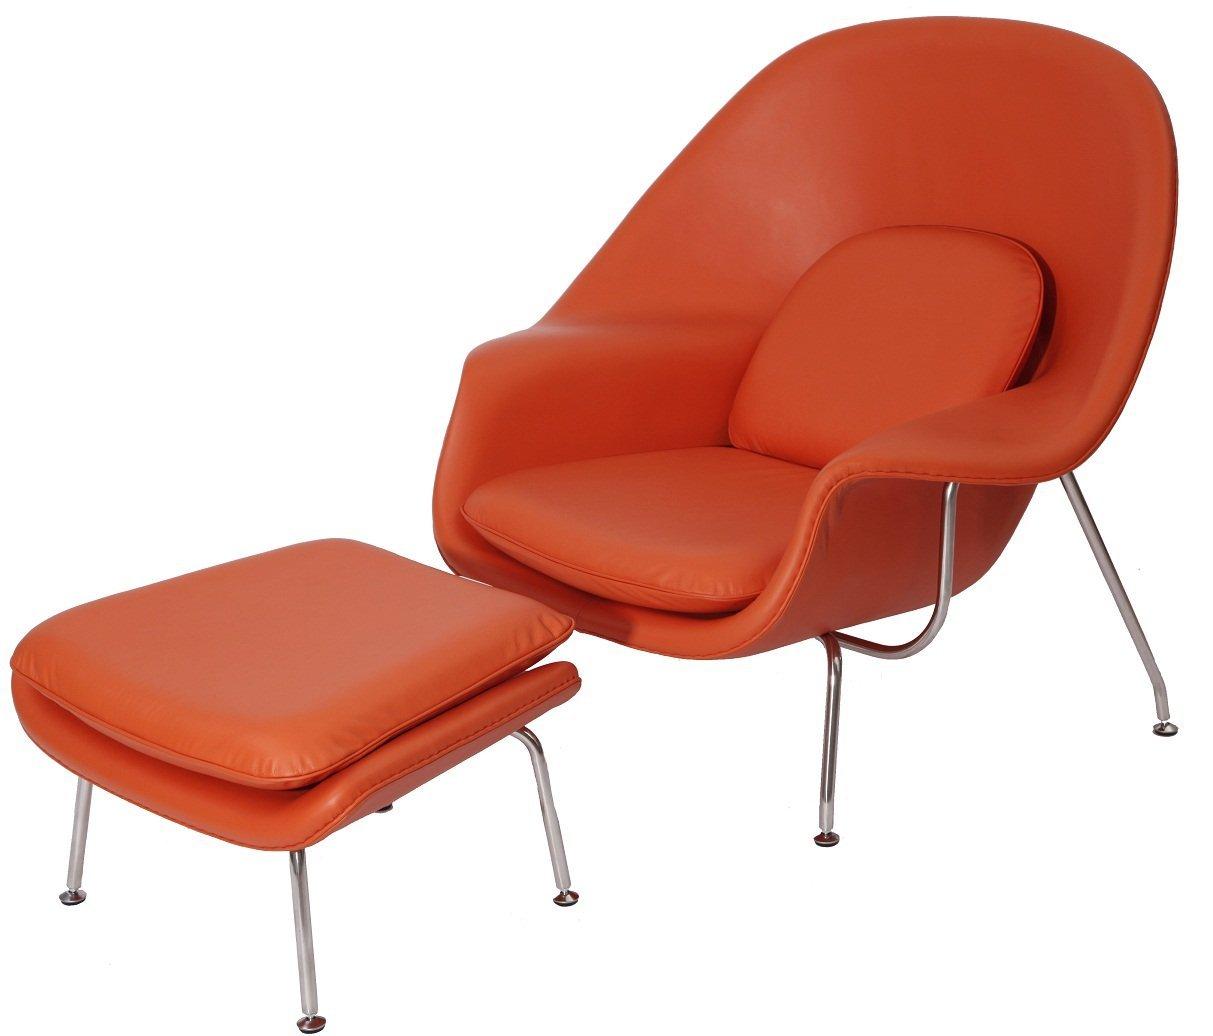 Get Quotations · MLF Premium Version Eero Saarinen Womb Chair U0026 Ottoman.  Italian Leather U0026 PU Foam.